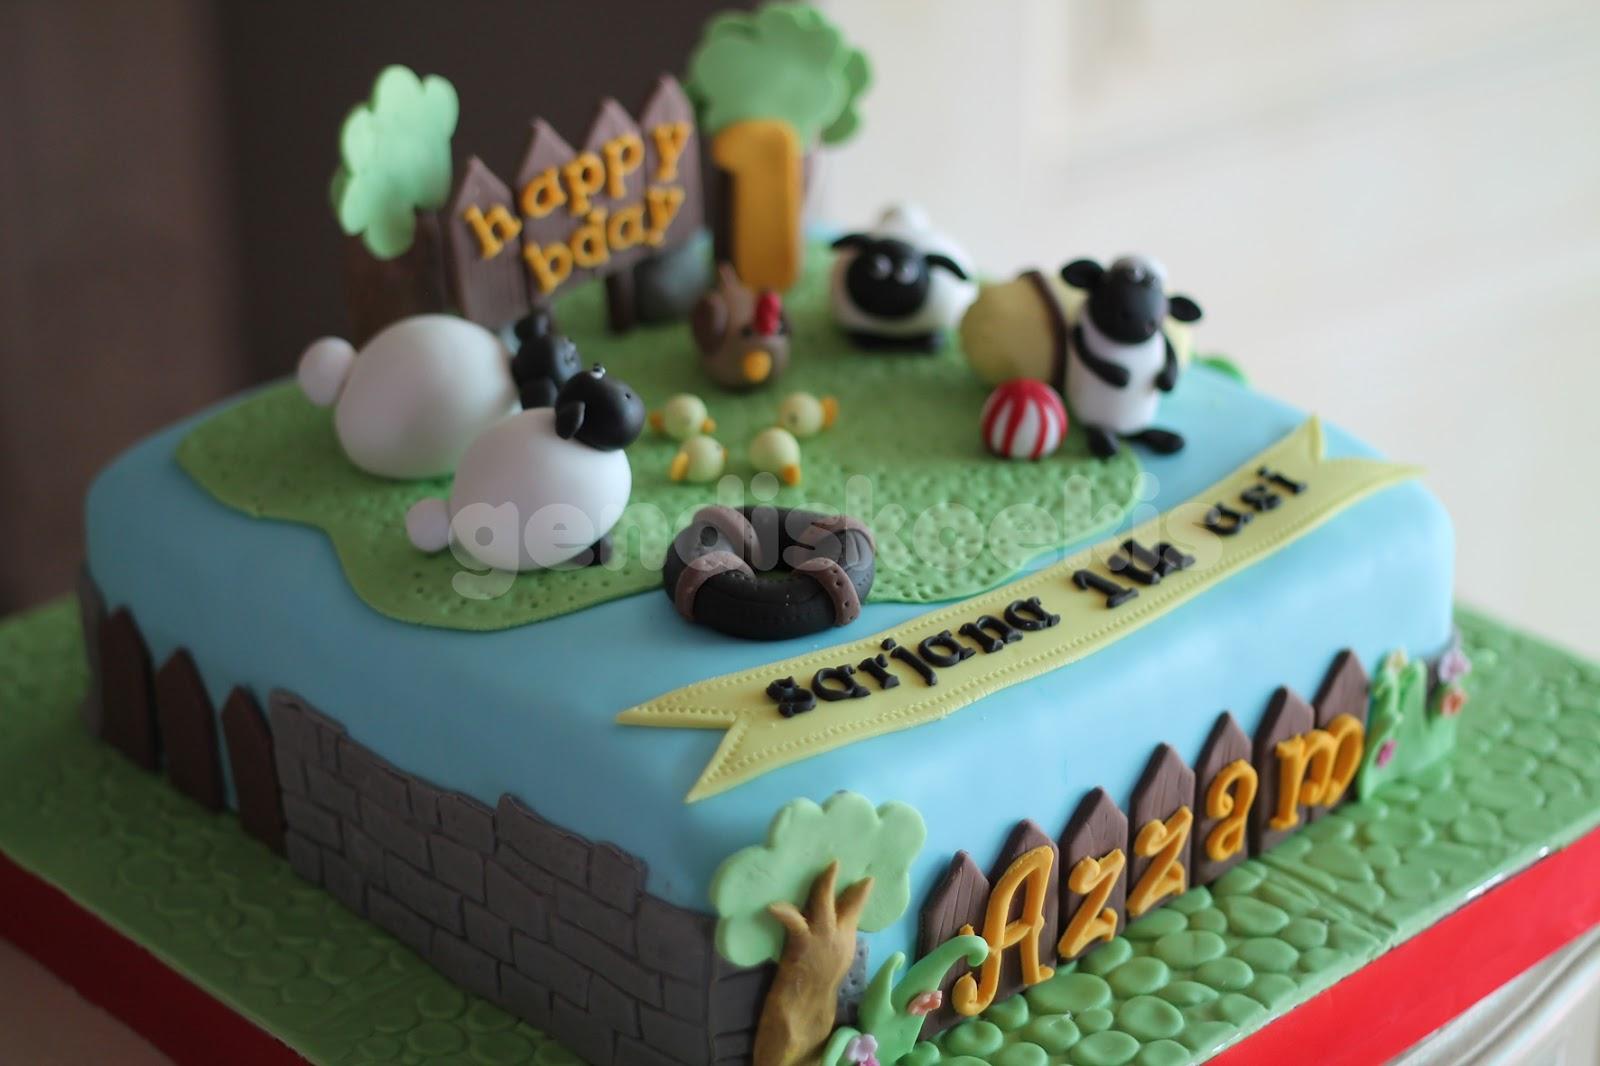 Gendiskoekis Shaun The Sheep Bday Cake